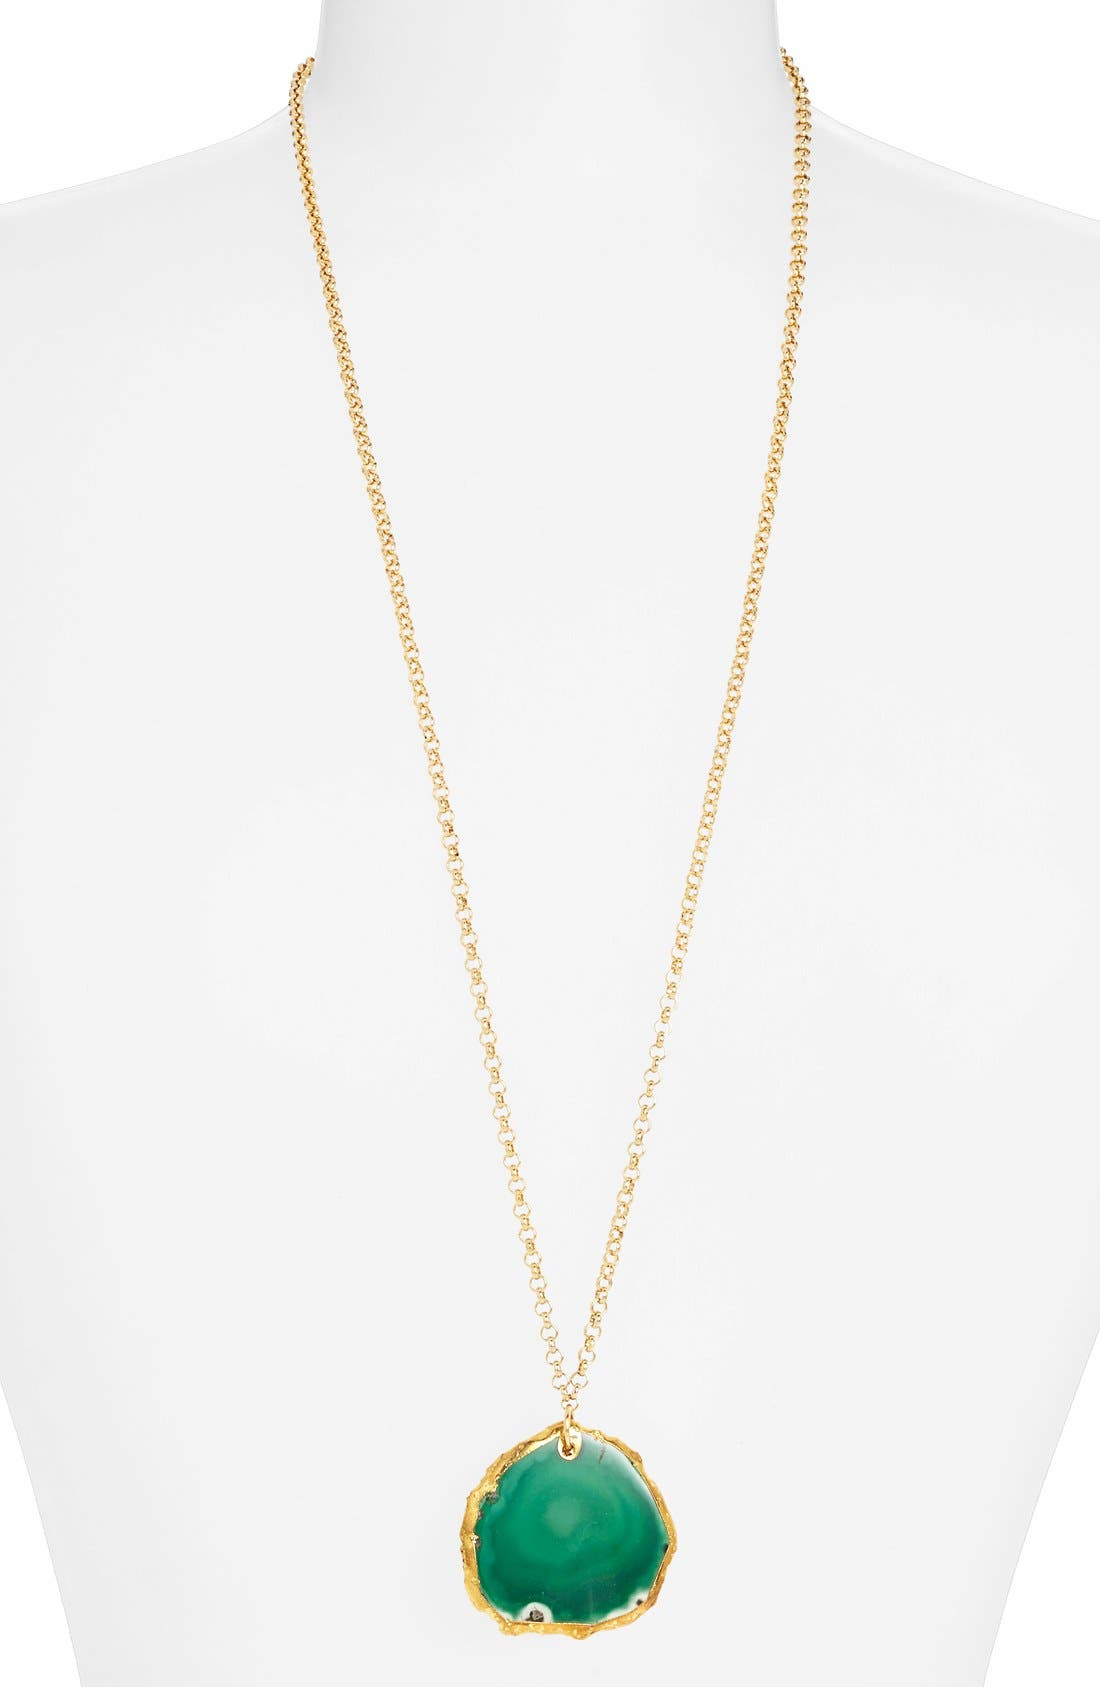 Main Image - Nordstrom 'Sorcerer's Stone' Long Pendant Necklace